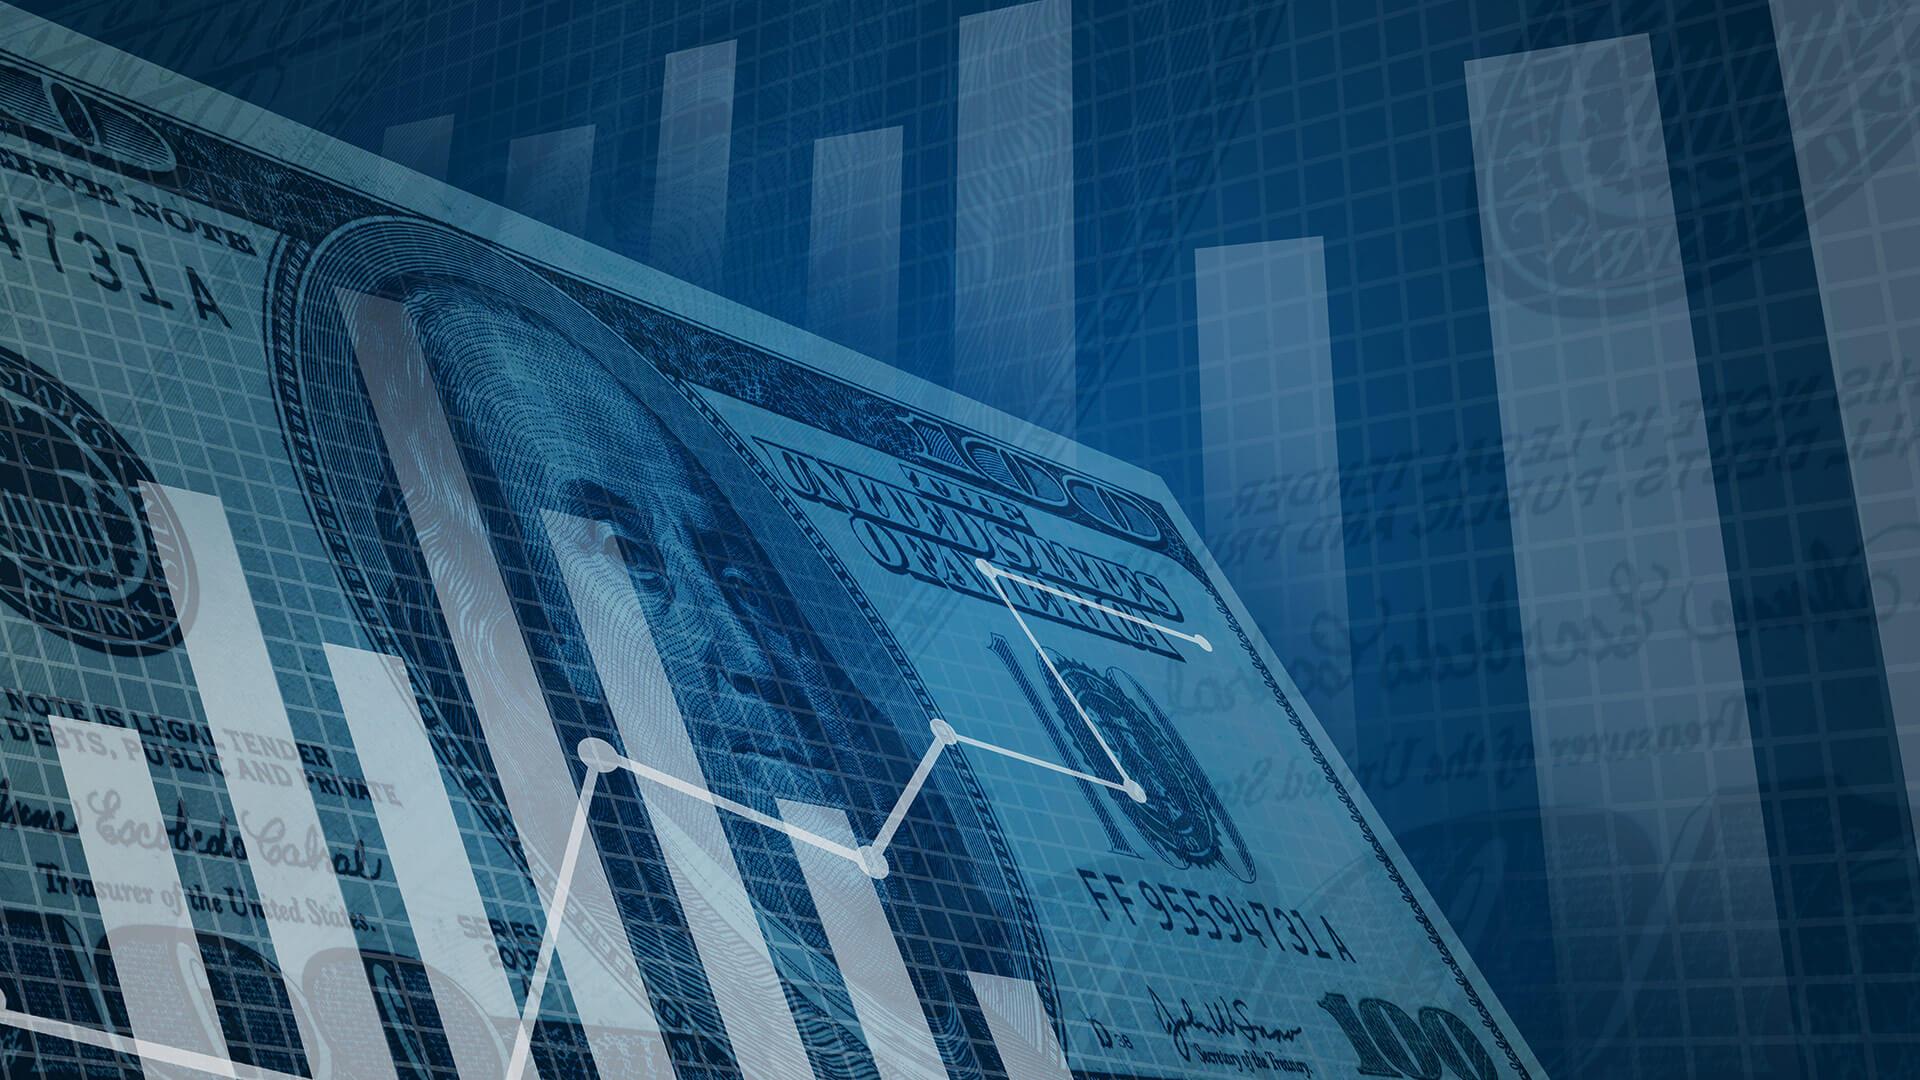 Enterprise Digital Analytics Platforms ñ New Market Intelligence Report